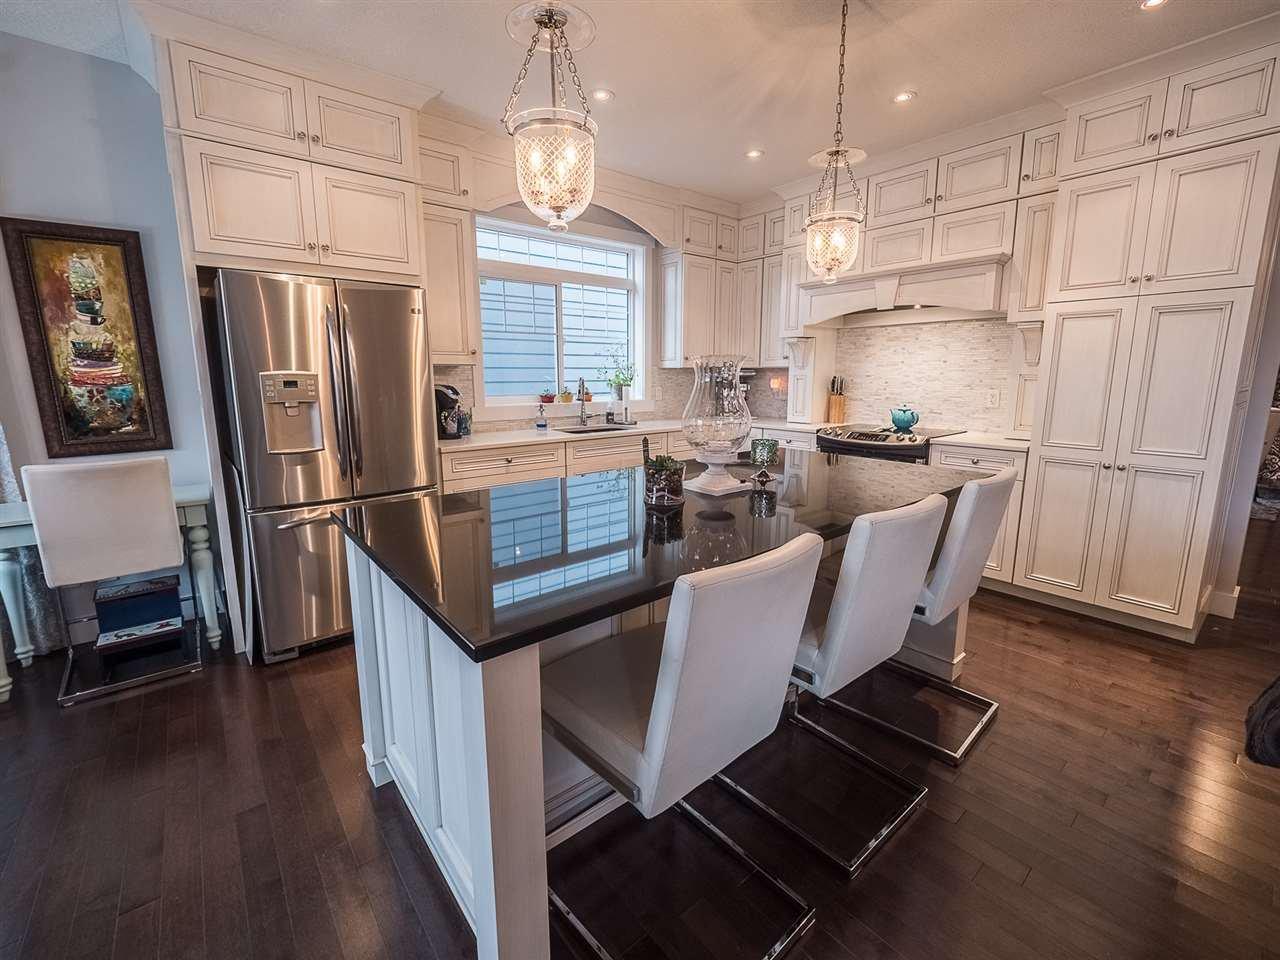 Main Photo: 7807 SUMMERSIDE GRANDE Boulevard in Edmonton: Zone 53 House for sale : MLS®# E4167608